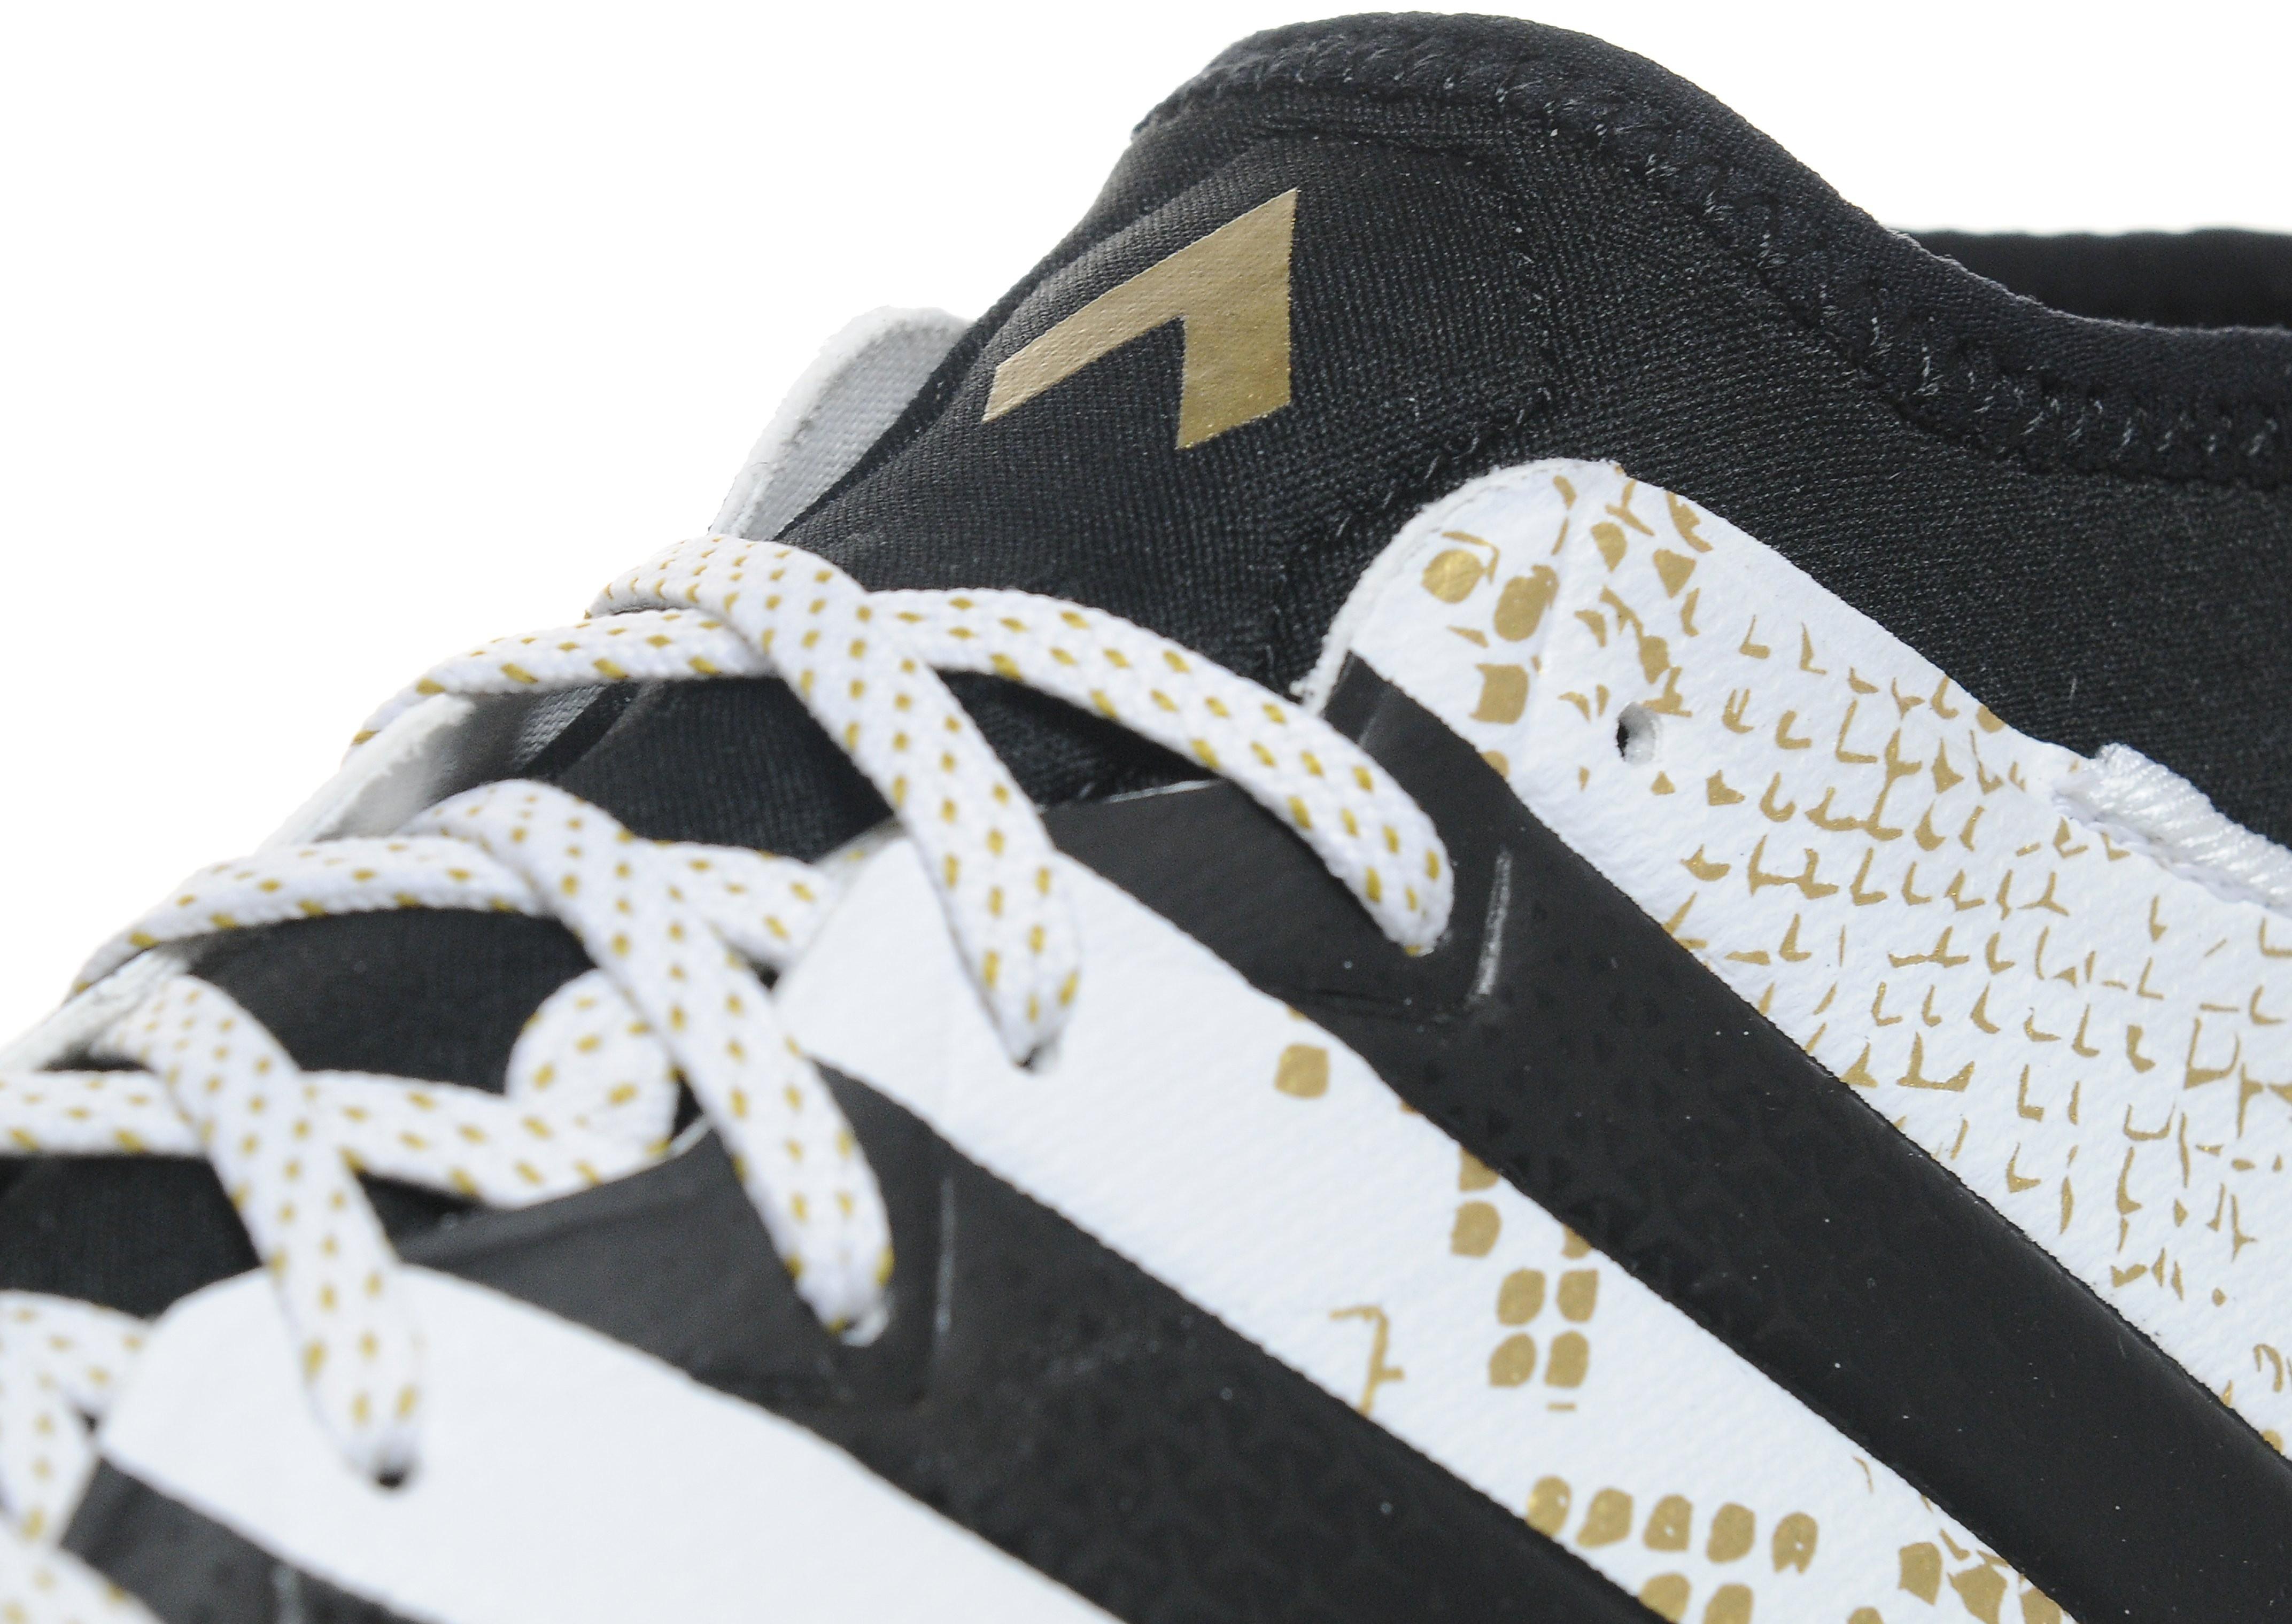 adidas Stellar Ace 16.3 Primemesh Turf